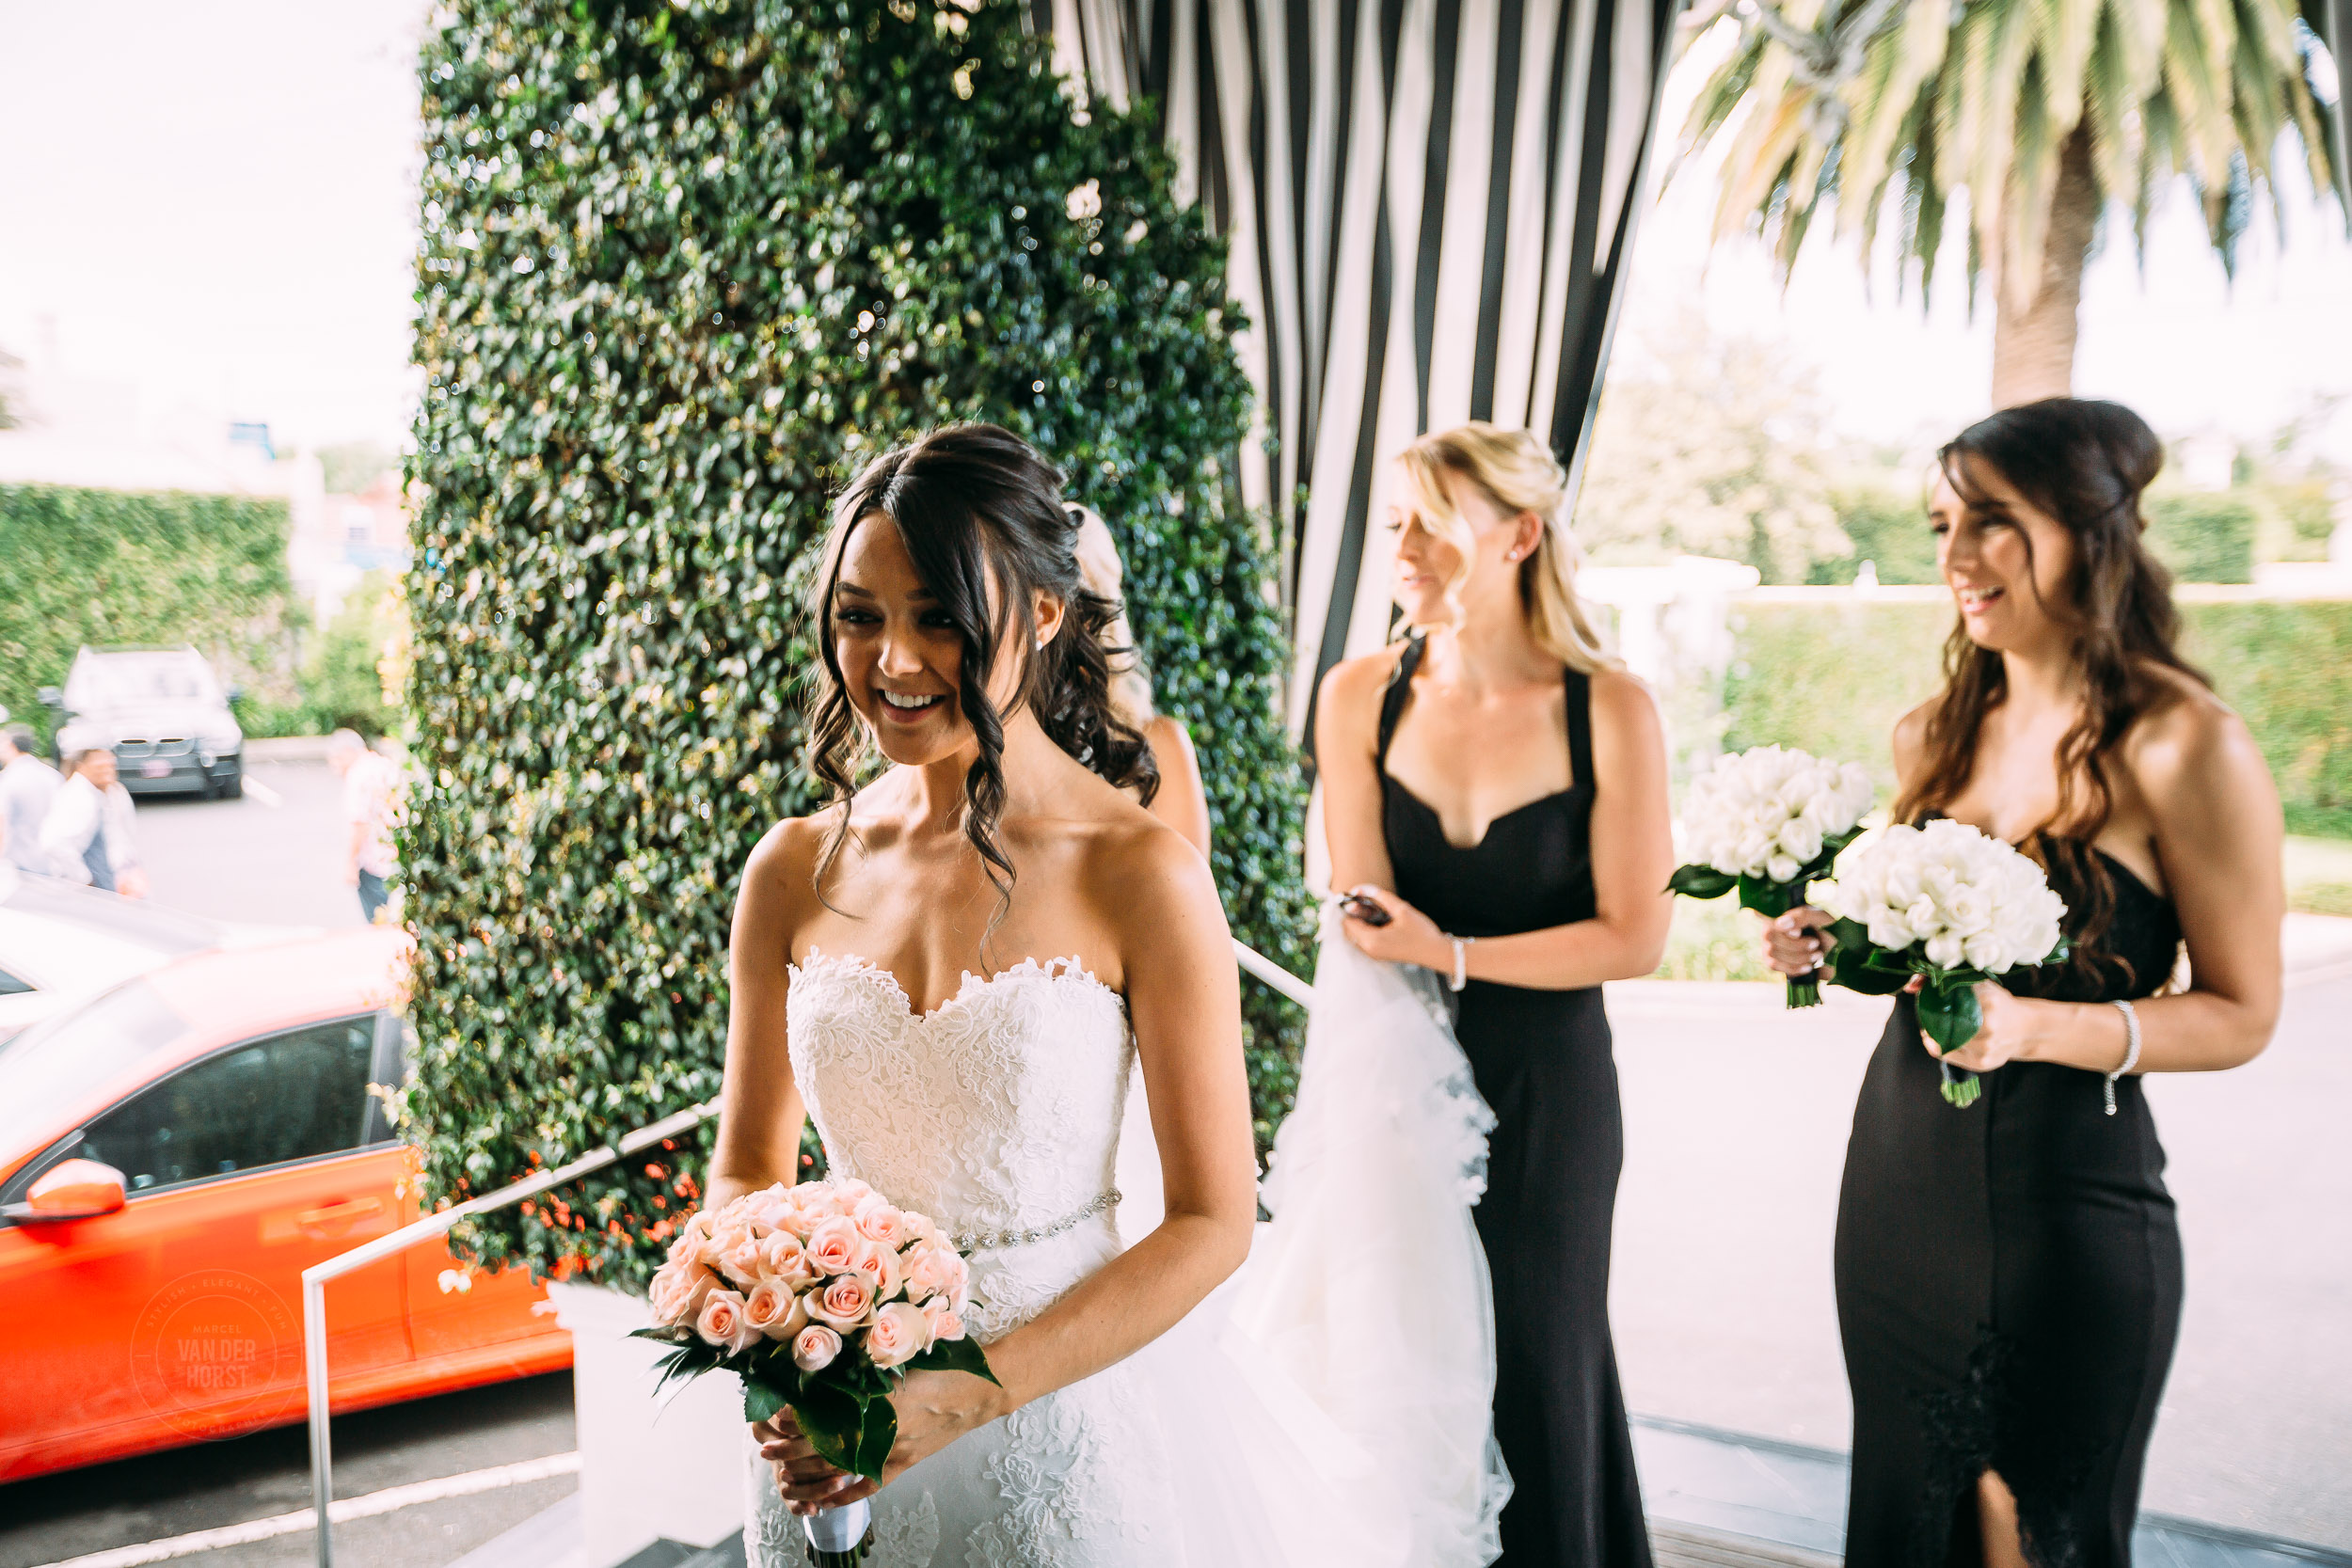 Melbourne-Wedding-Photographer-1022.jpg